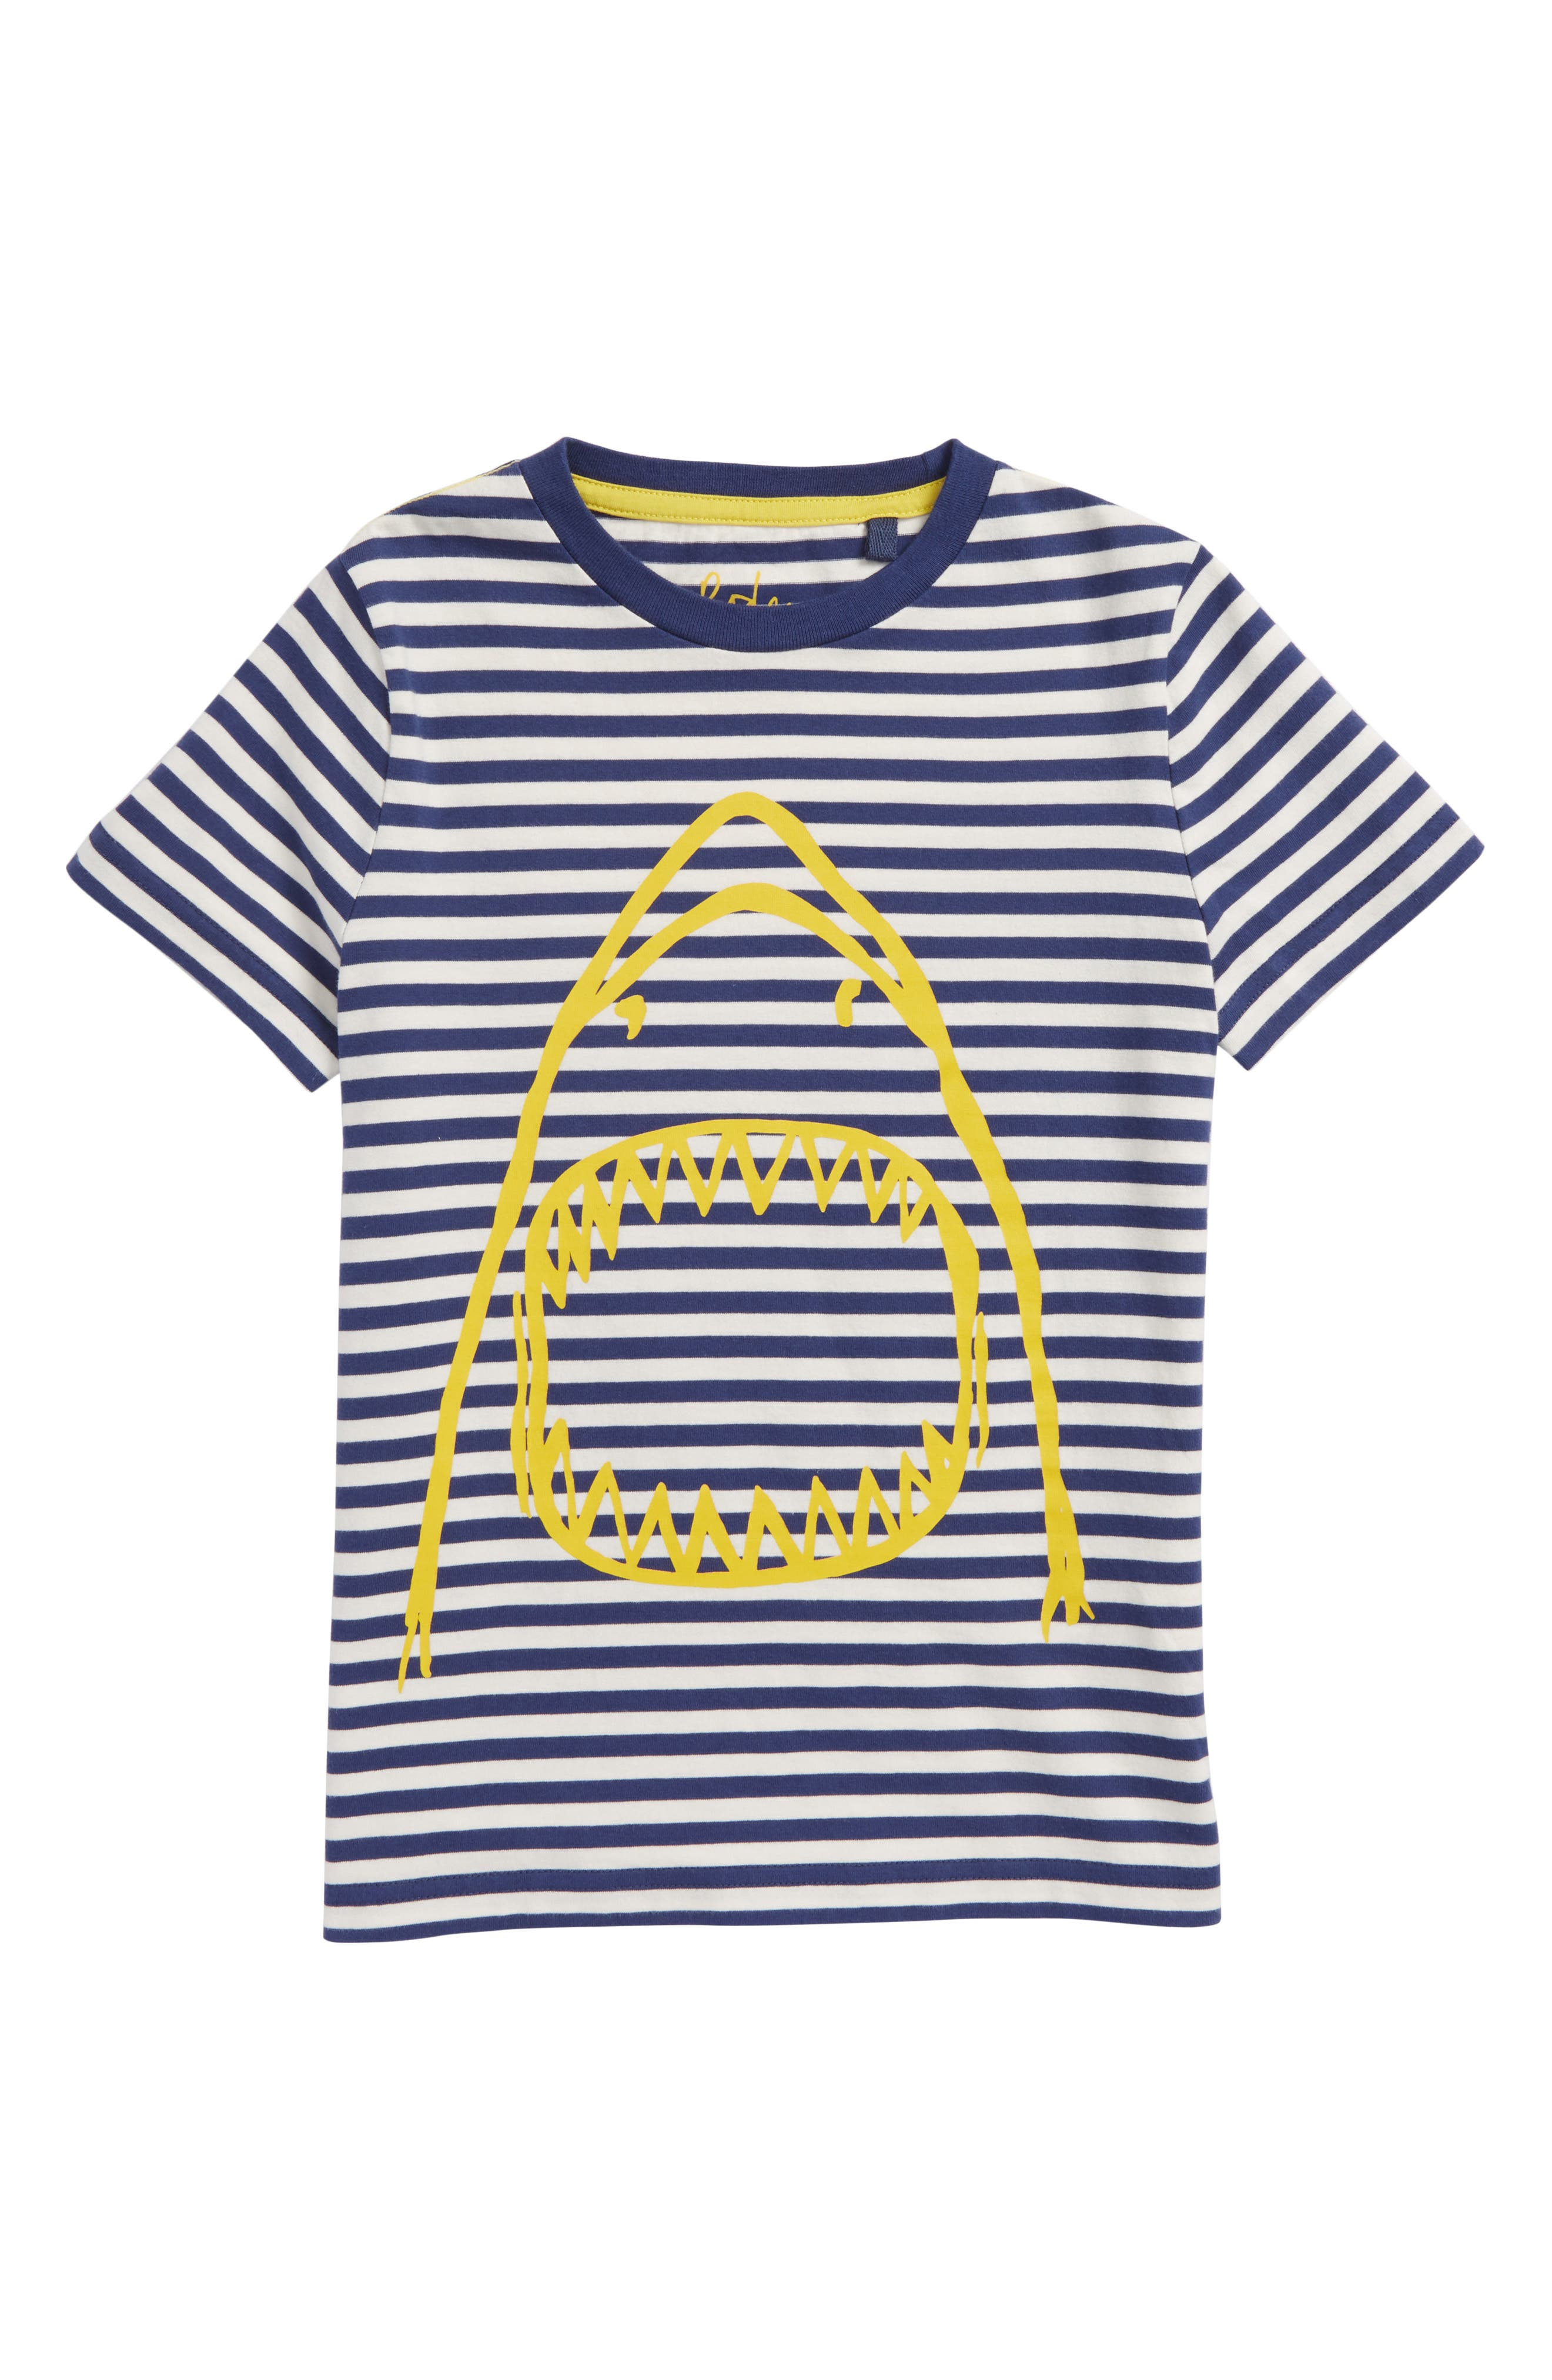 Arty Shark T-Shirt,                         Main,                         color, Beacon Blue/ Ecru Shark